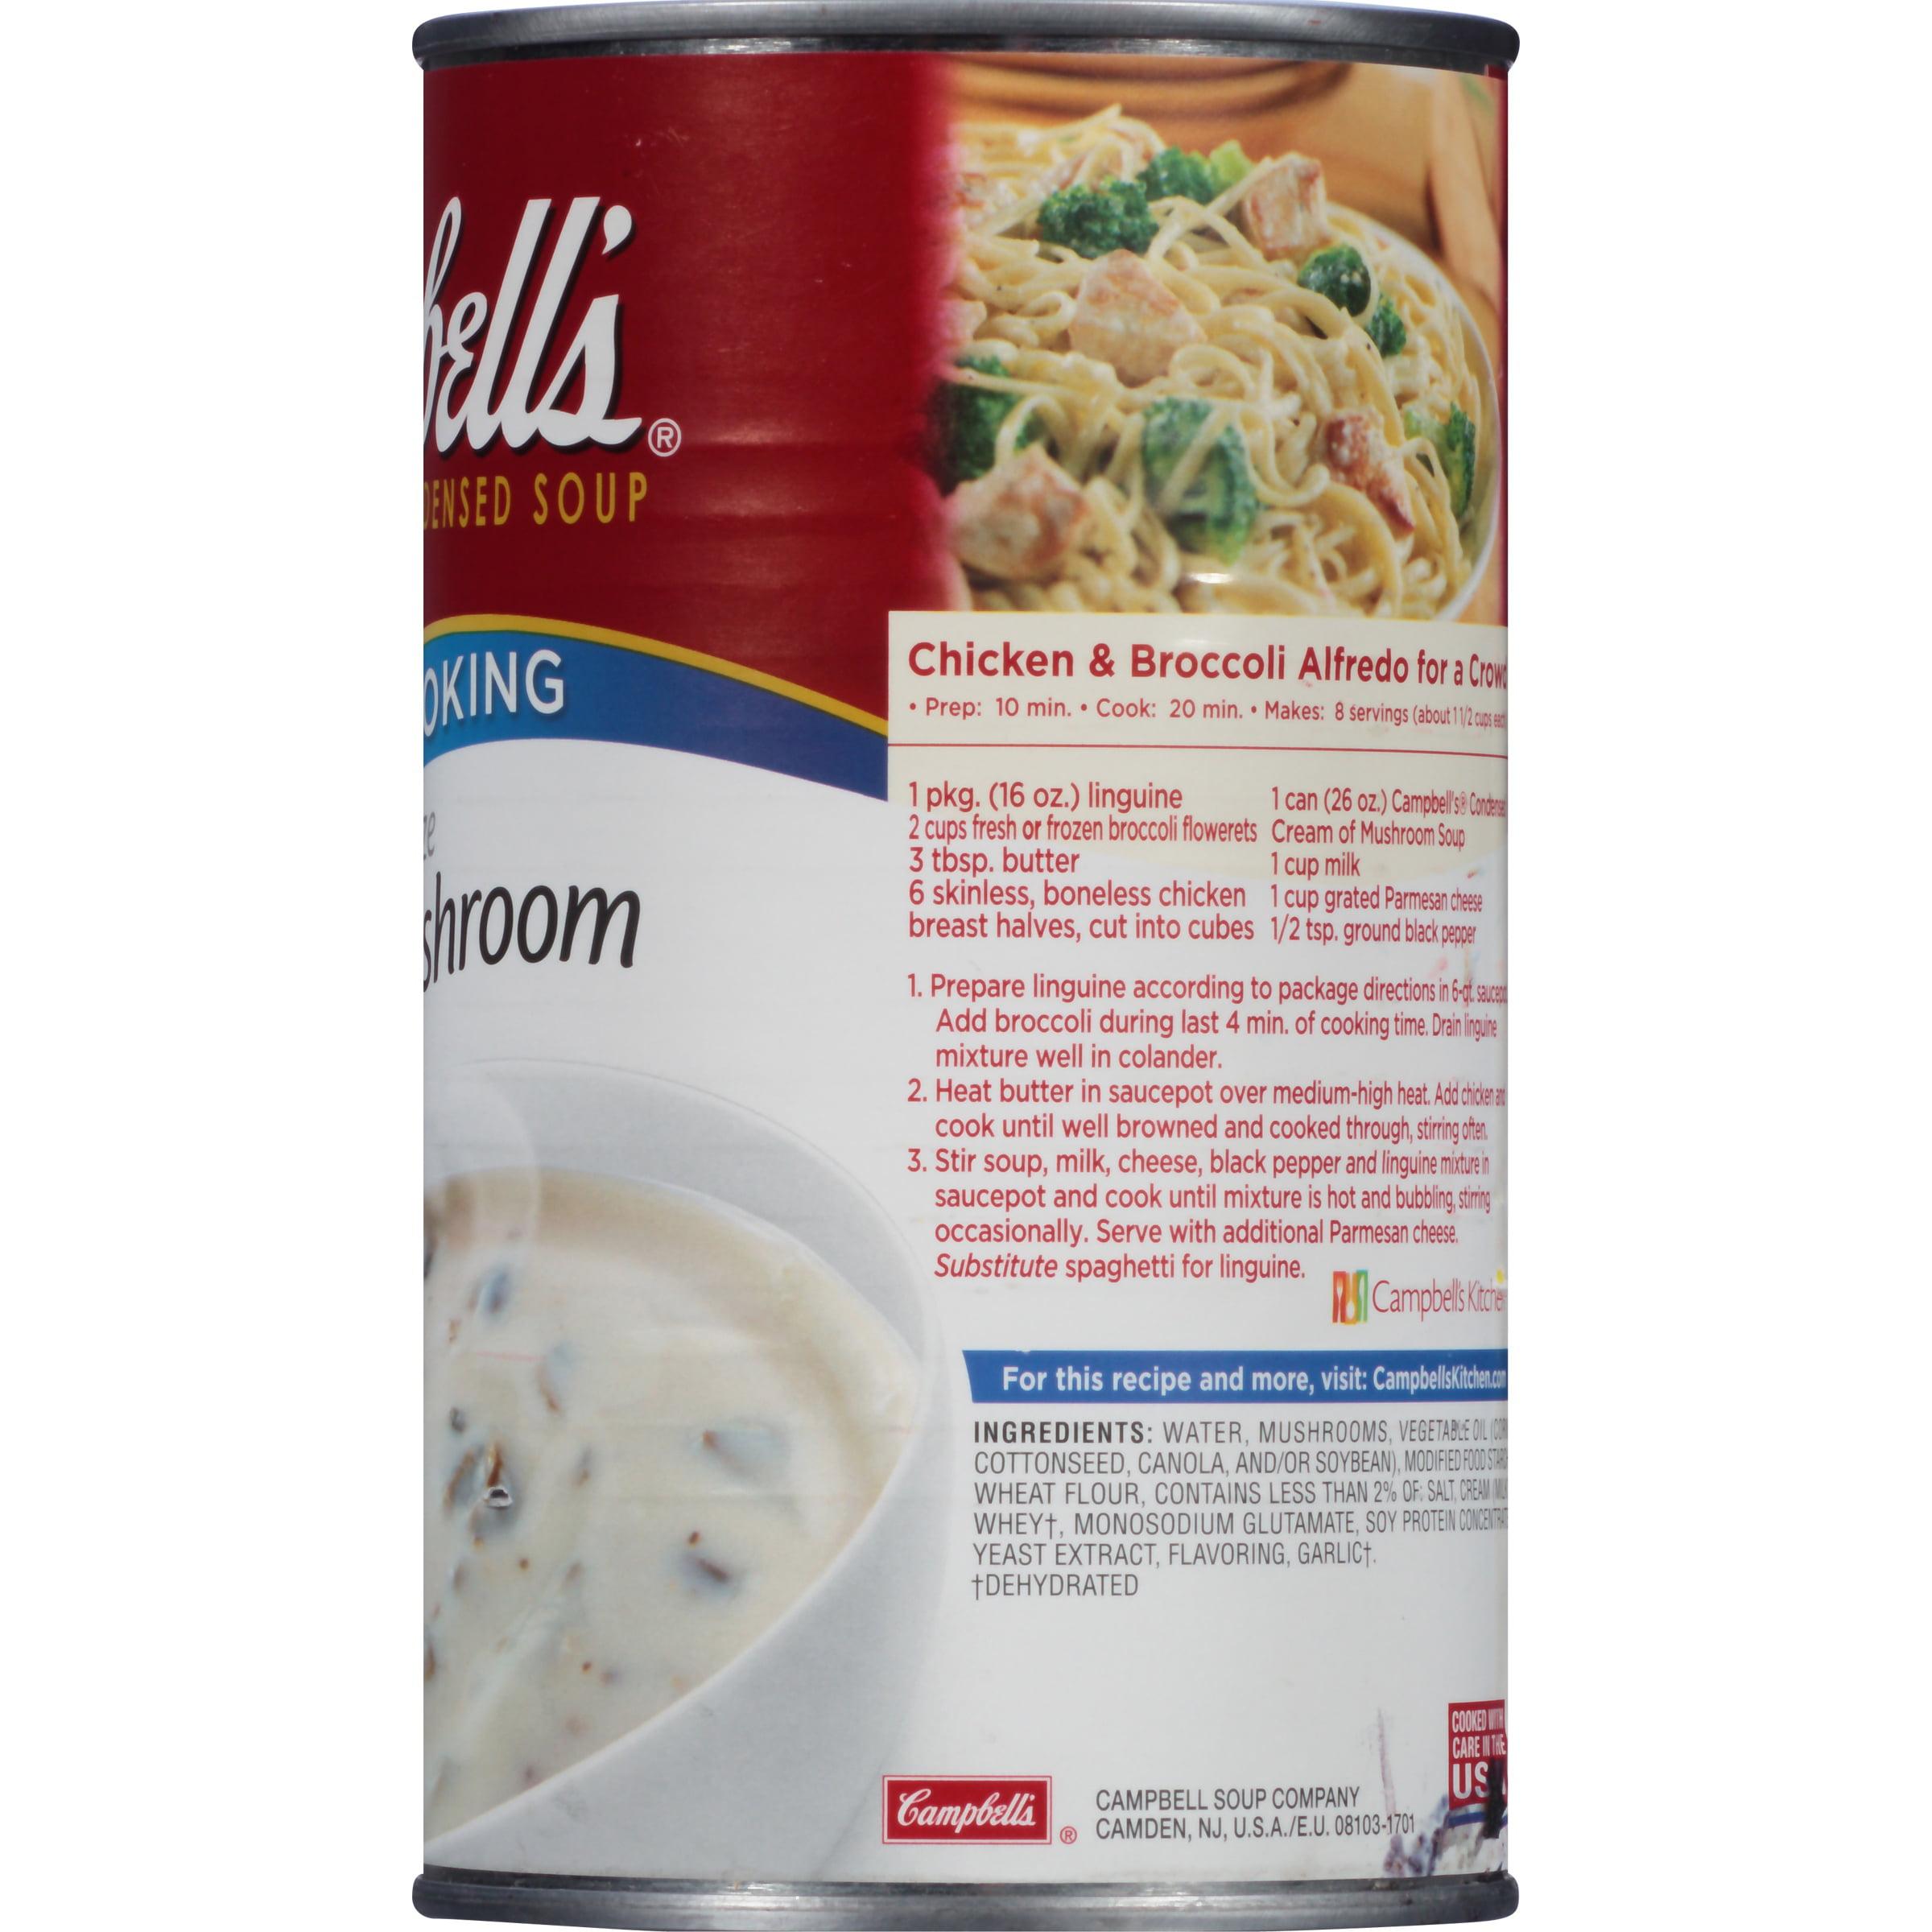 Campbellu0027s Cream Of Mushroom Family Size Ru0026W Condensed Soup, 26 Oz    Walmart.com